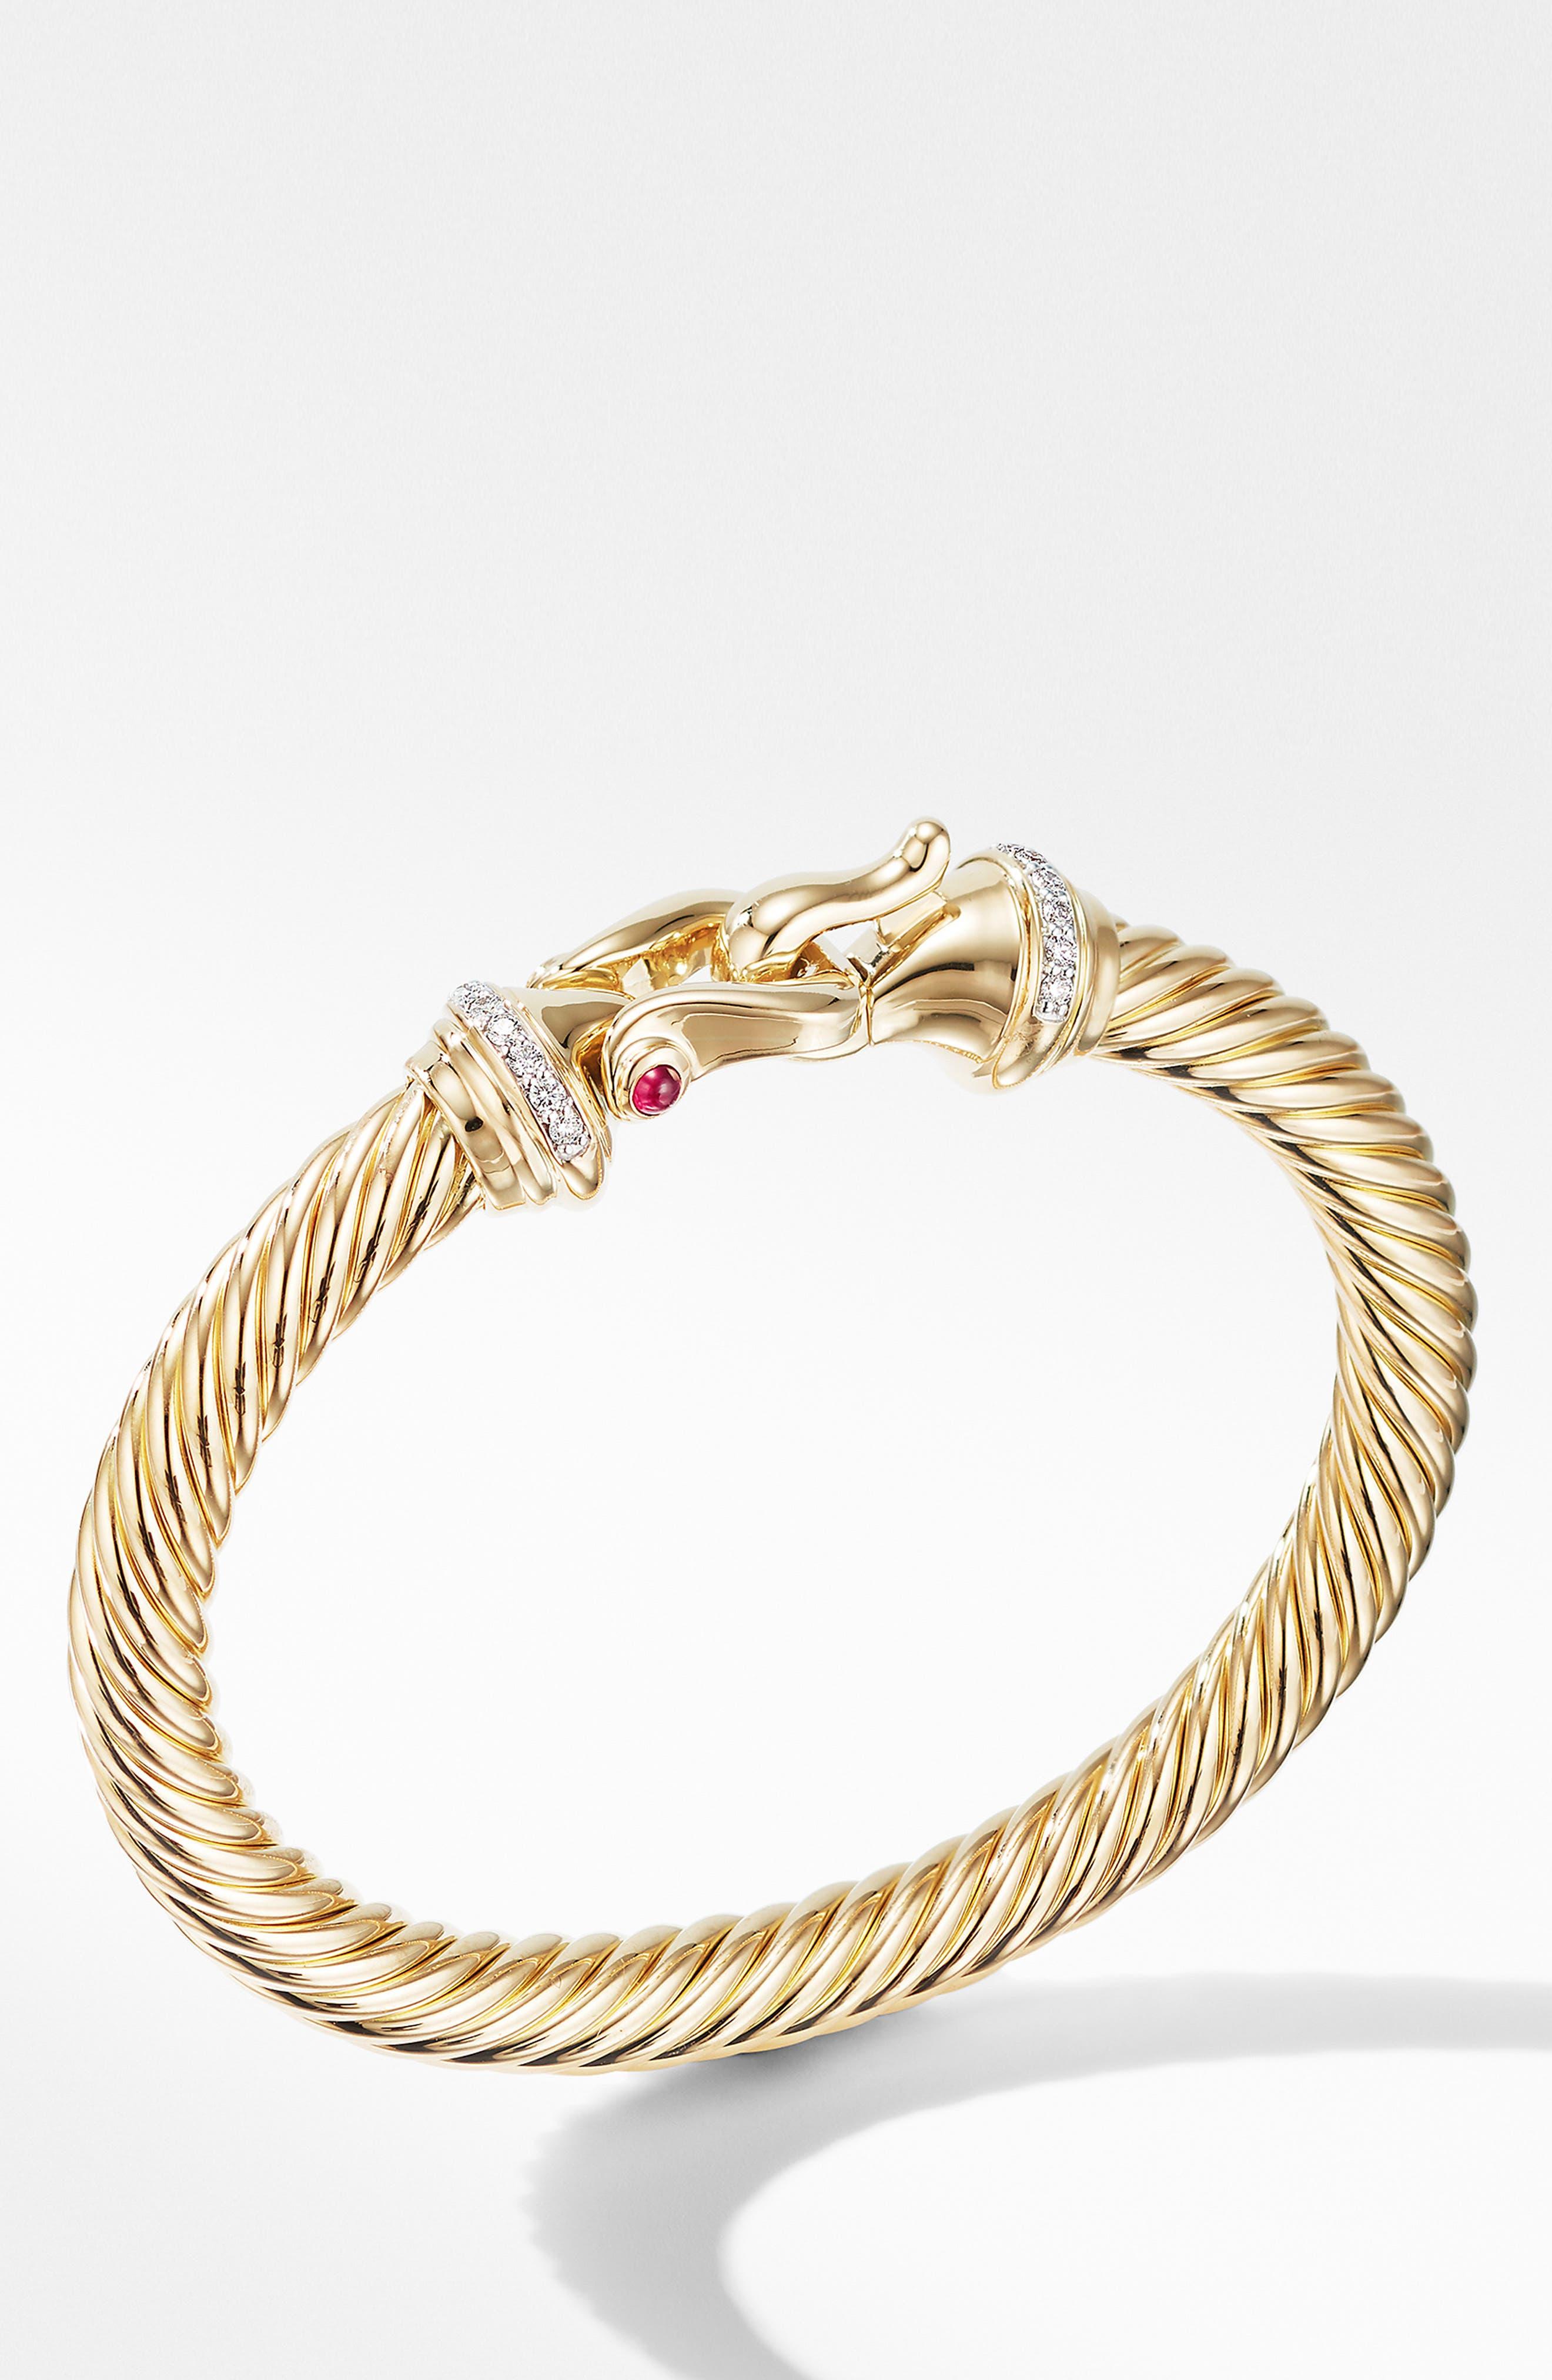 DAVID YURMAN, Cable Buckle Bracelet with Diamonds, Alternate thumbnail 2, color, GOLD/ RUBY/ DIAMOND